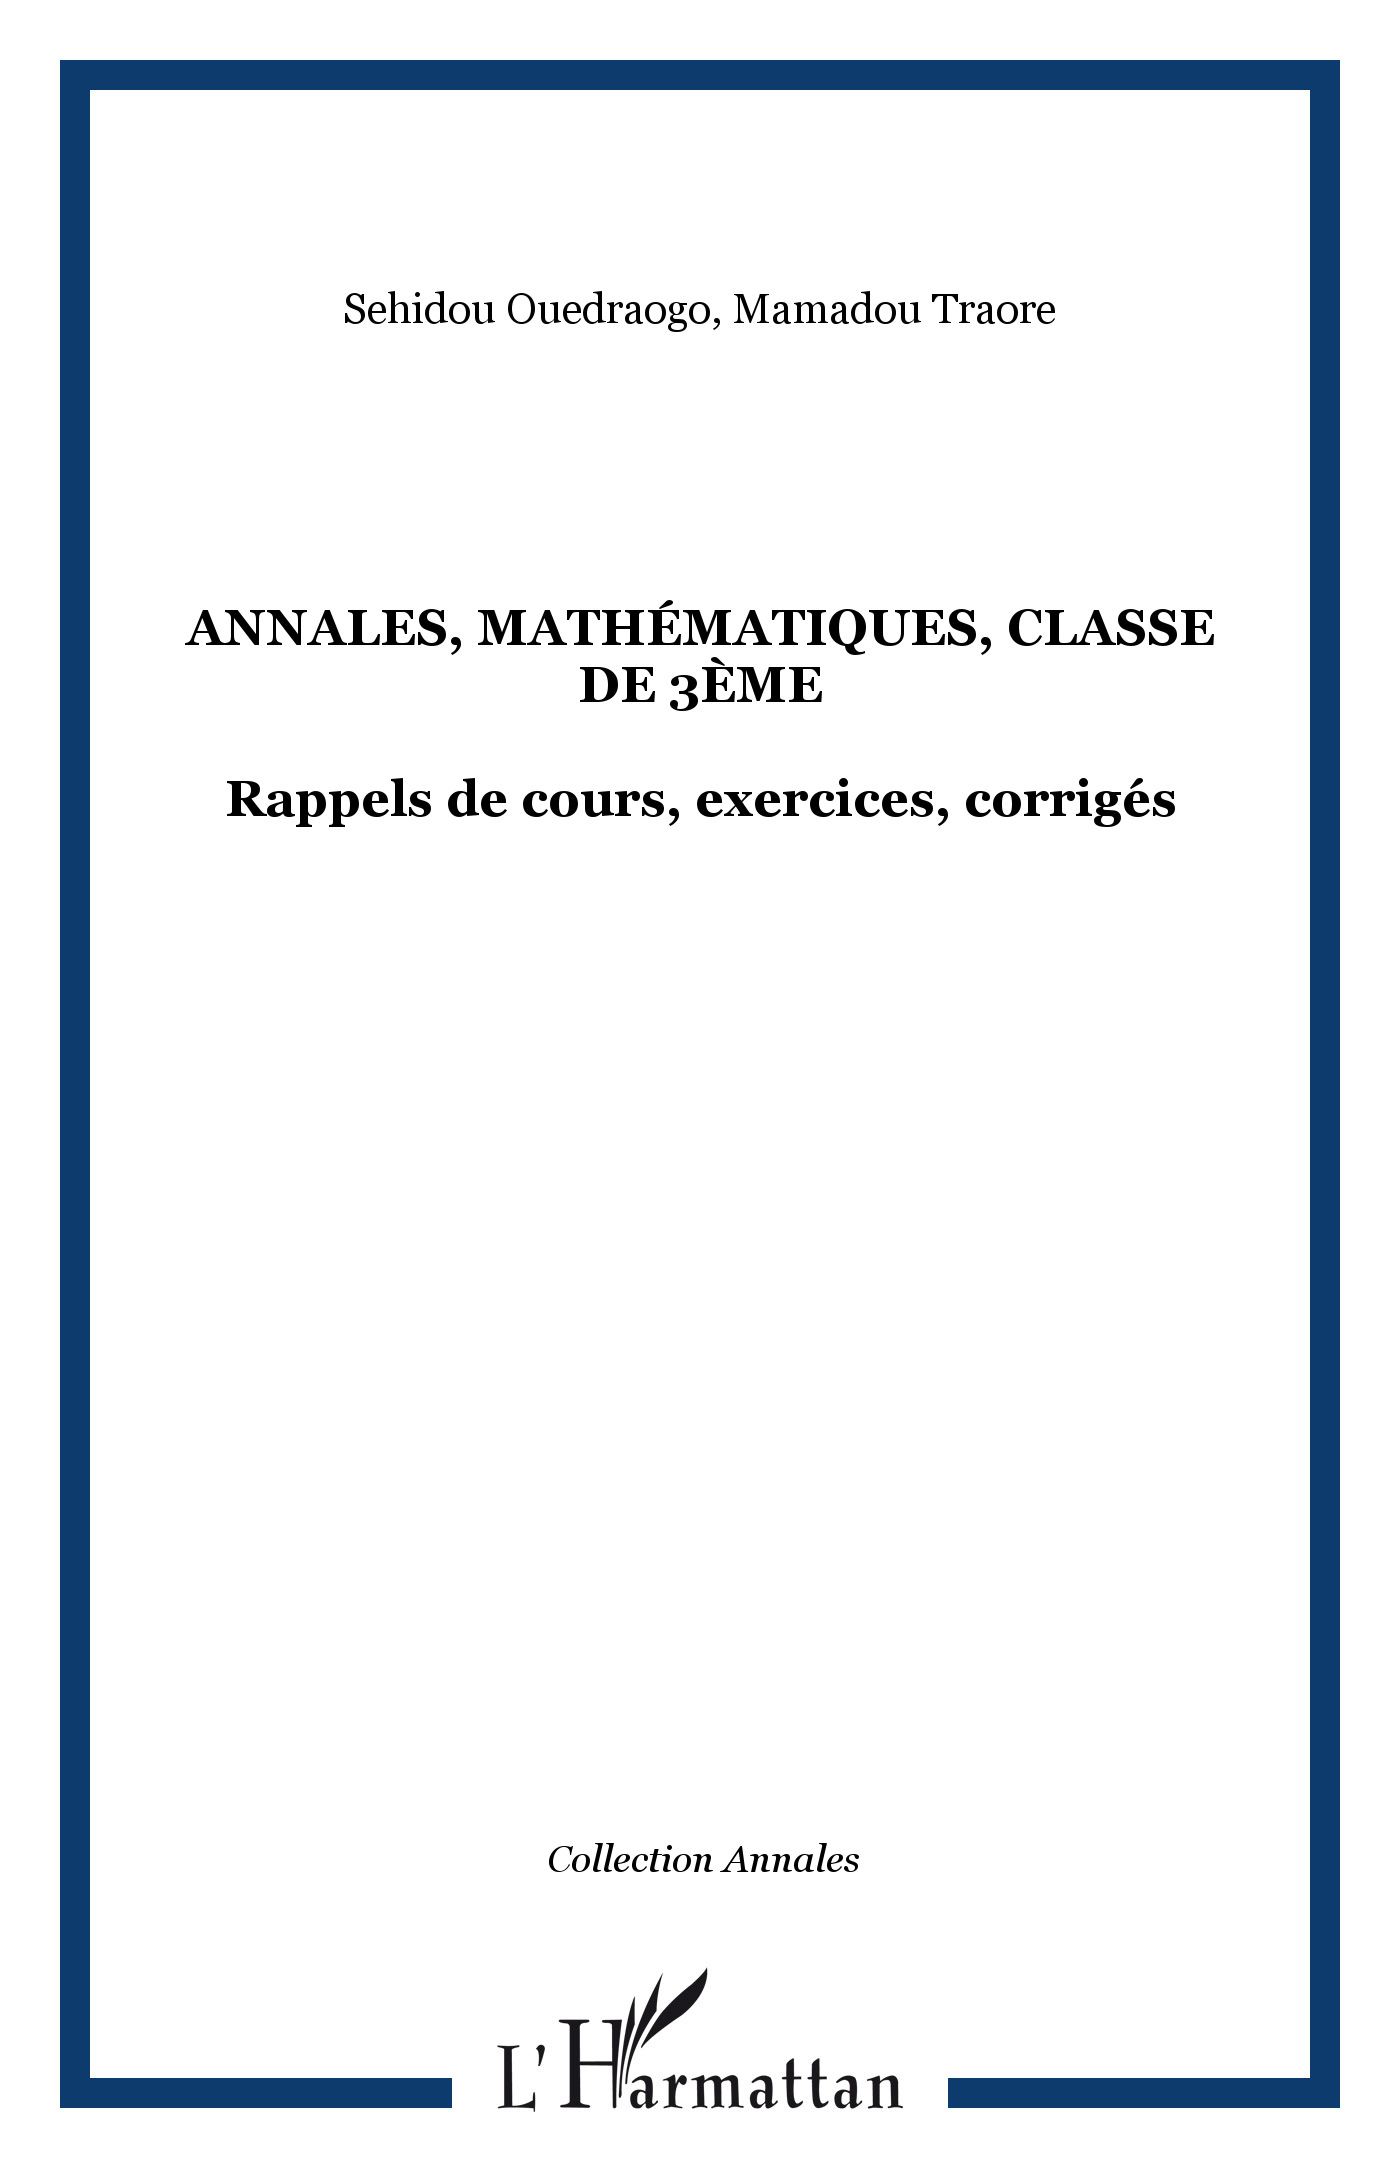 mathematiques 3eme exercices corriges